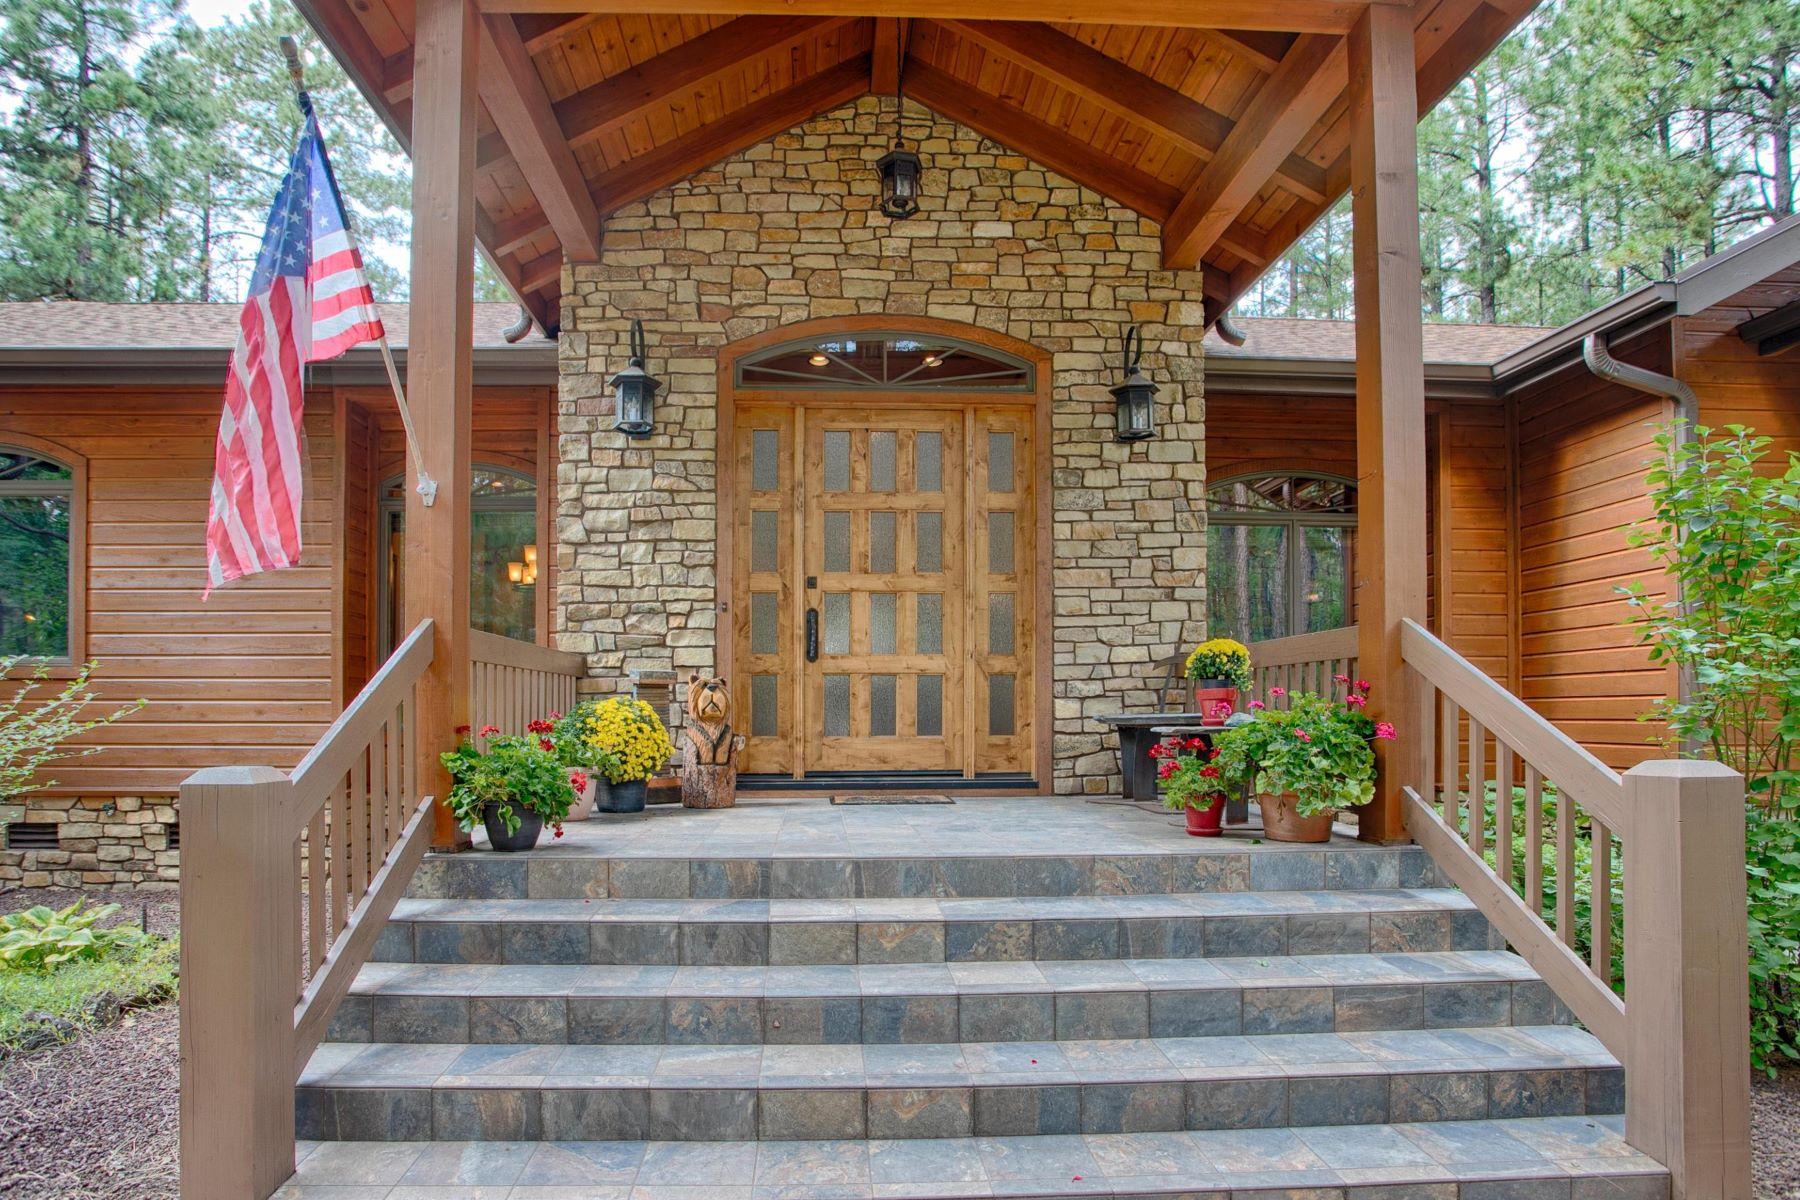 Single Family Homes for Sale at White Mountain Summer Homes 2736 E TURKEY RUN RD Pinetop, Arizona 85935 United States